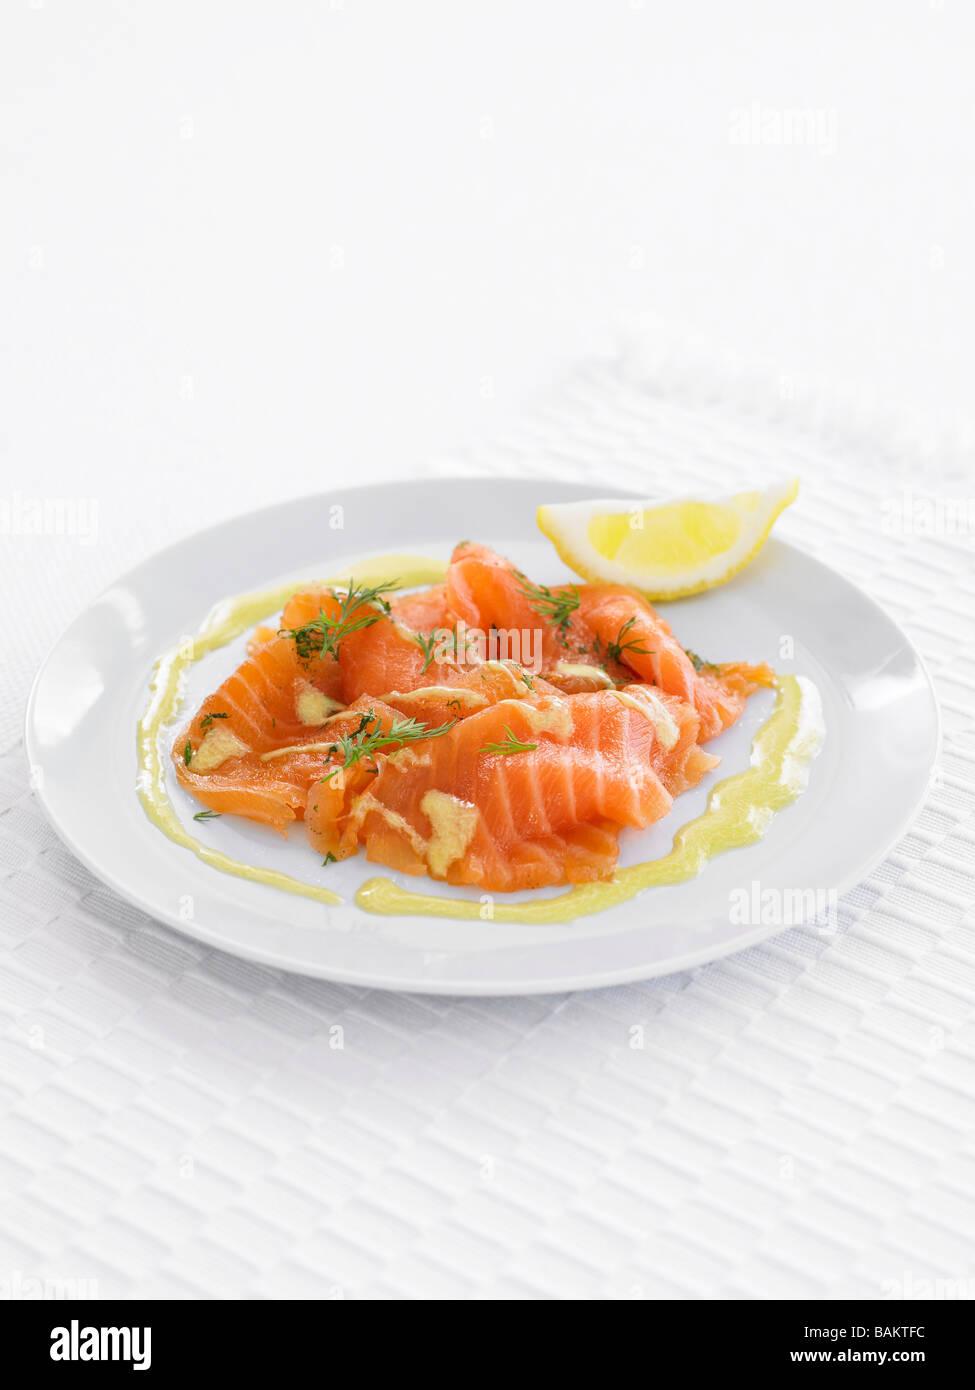 Marinated Salmon - Stock Image